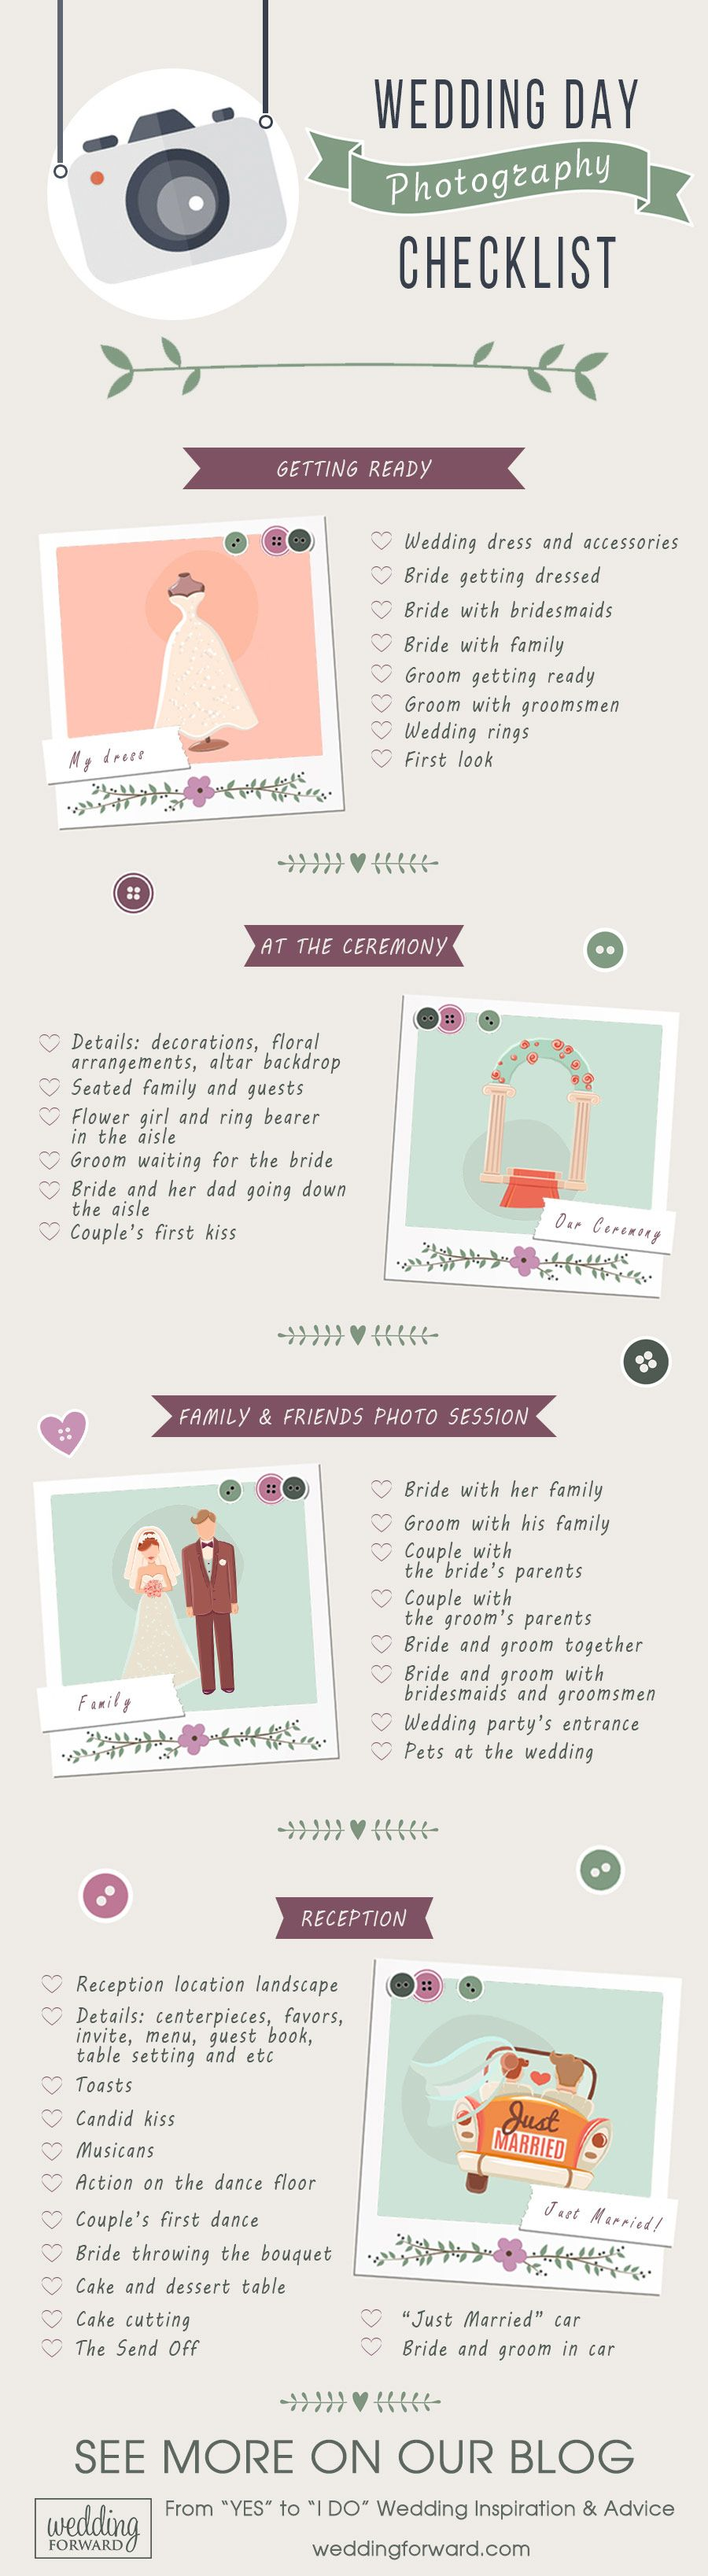 Must-Take Romantic Photos On Your Wedding Day ❤ See more: http://www.weddingforward.com/romantic-photos-wedding-day/ #weddings